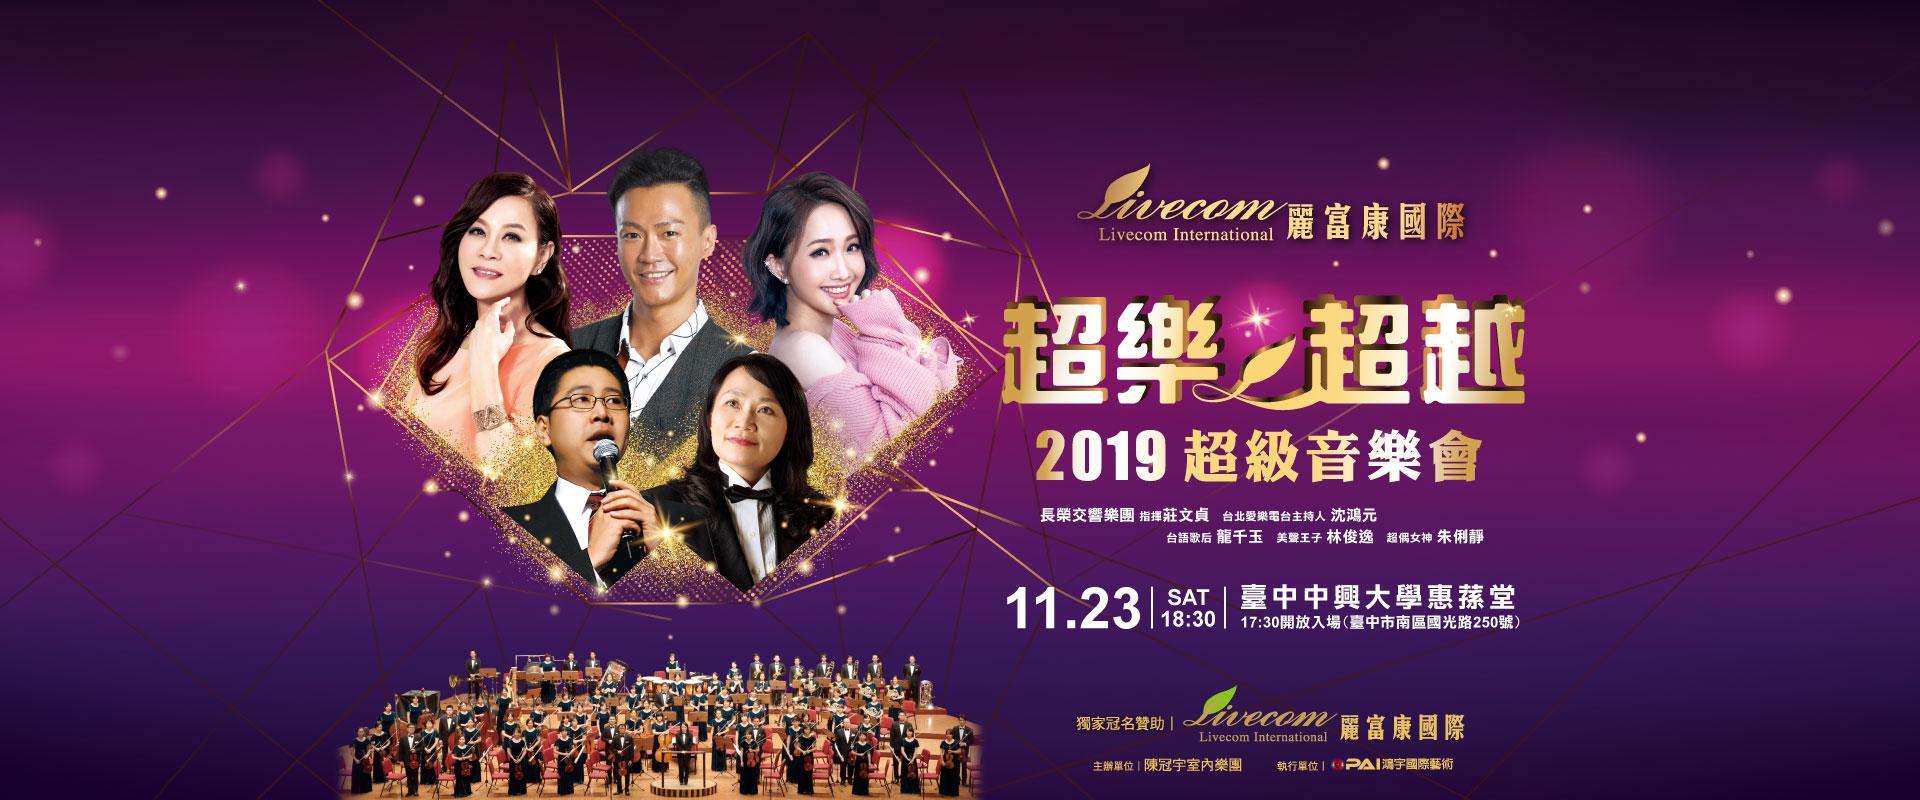 2019音樂會banner-官網